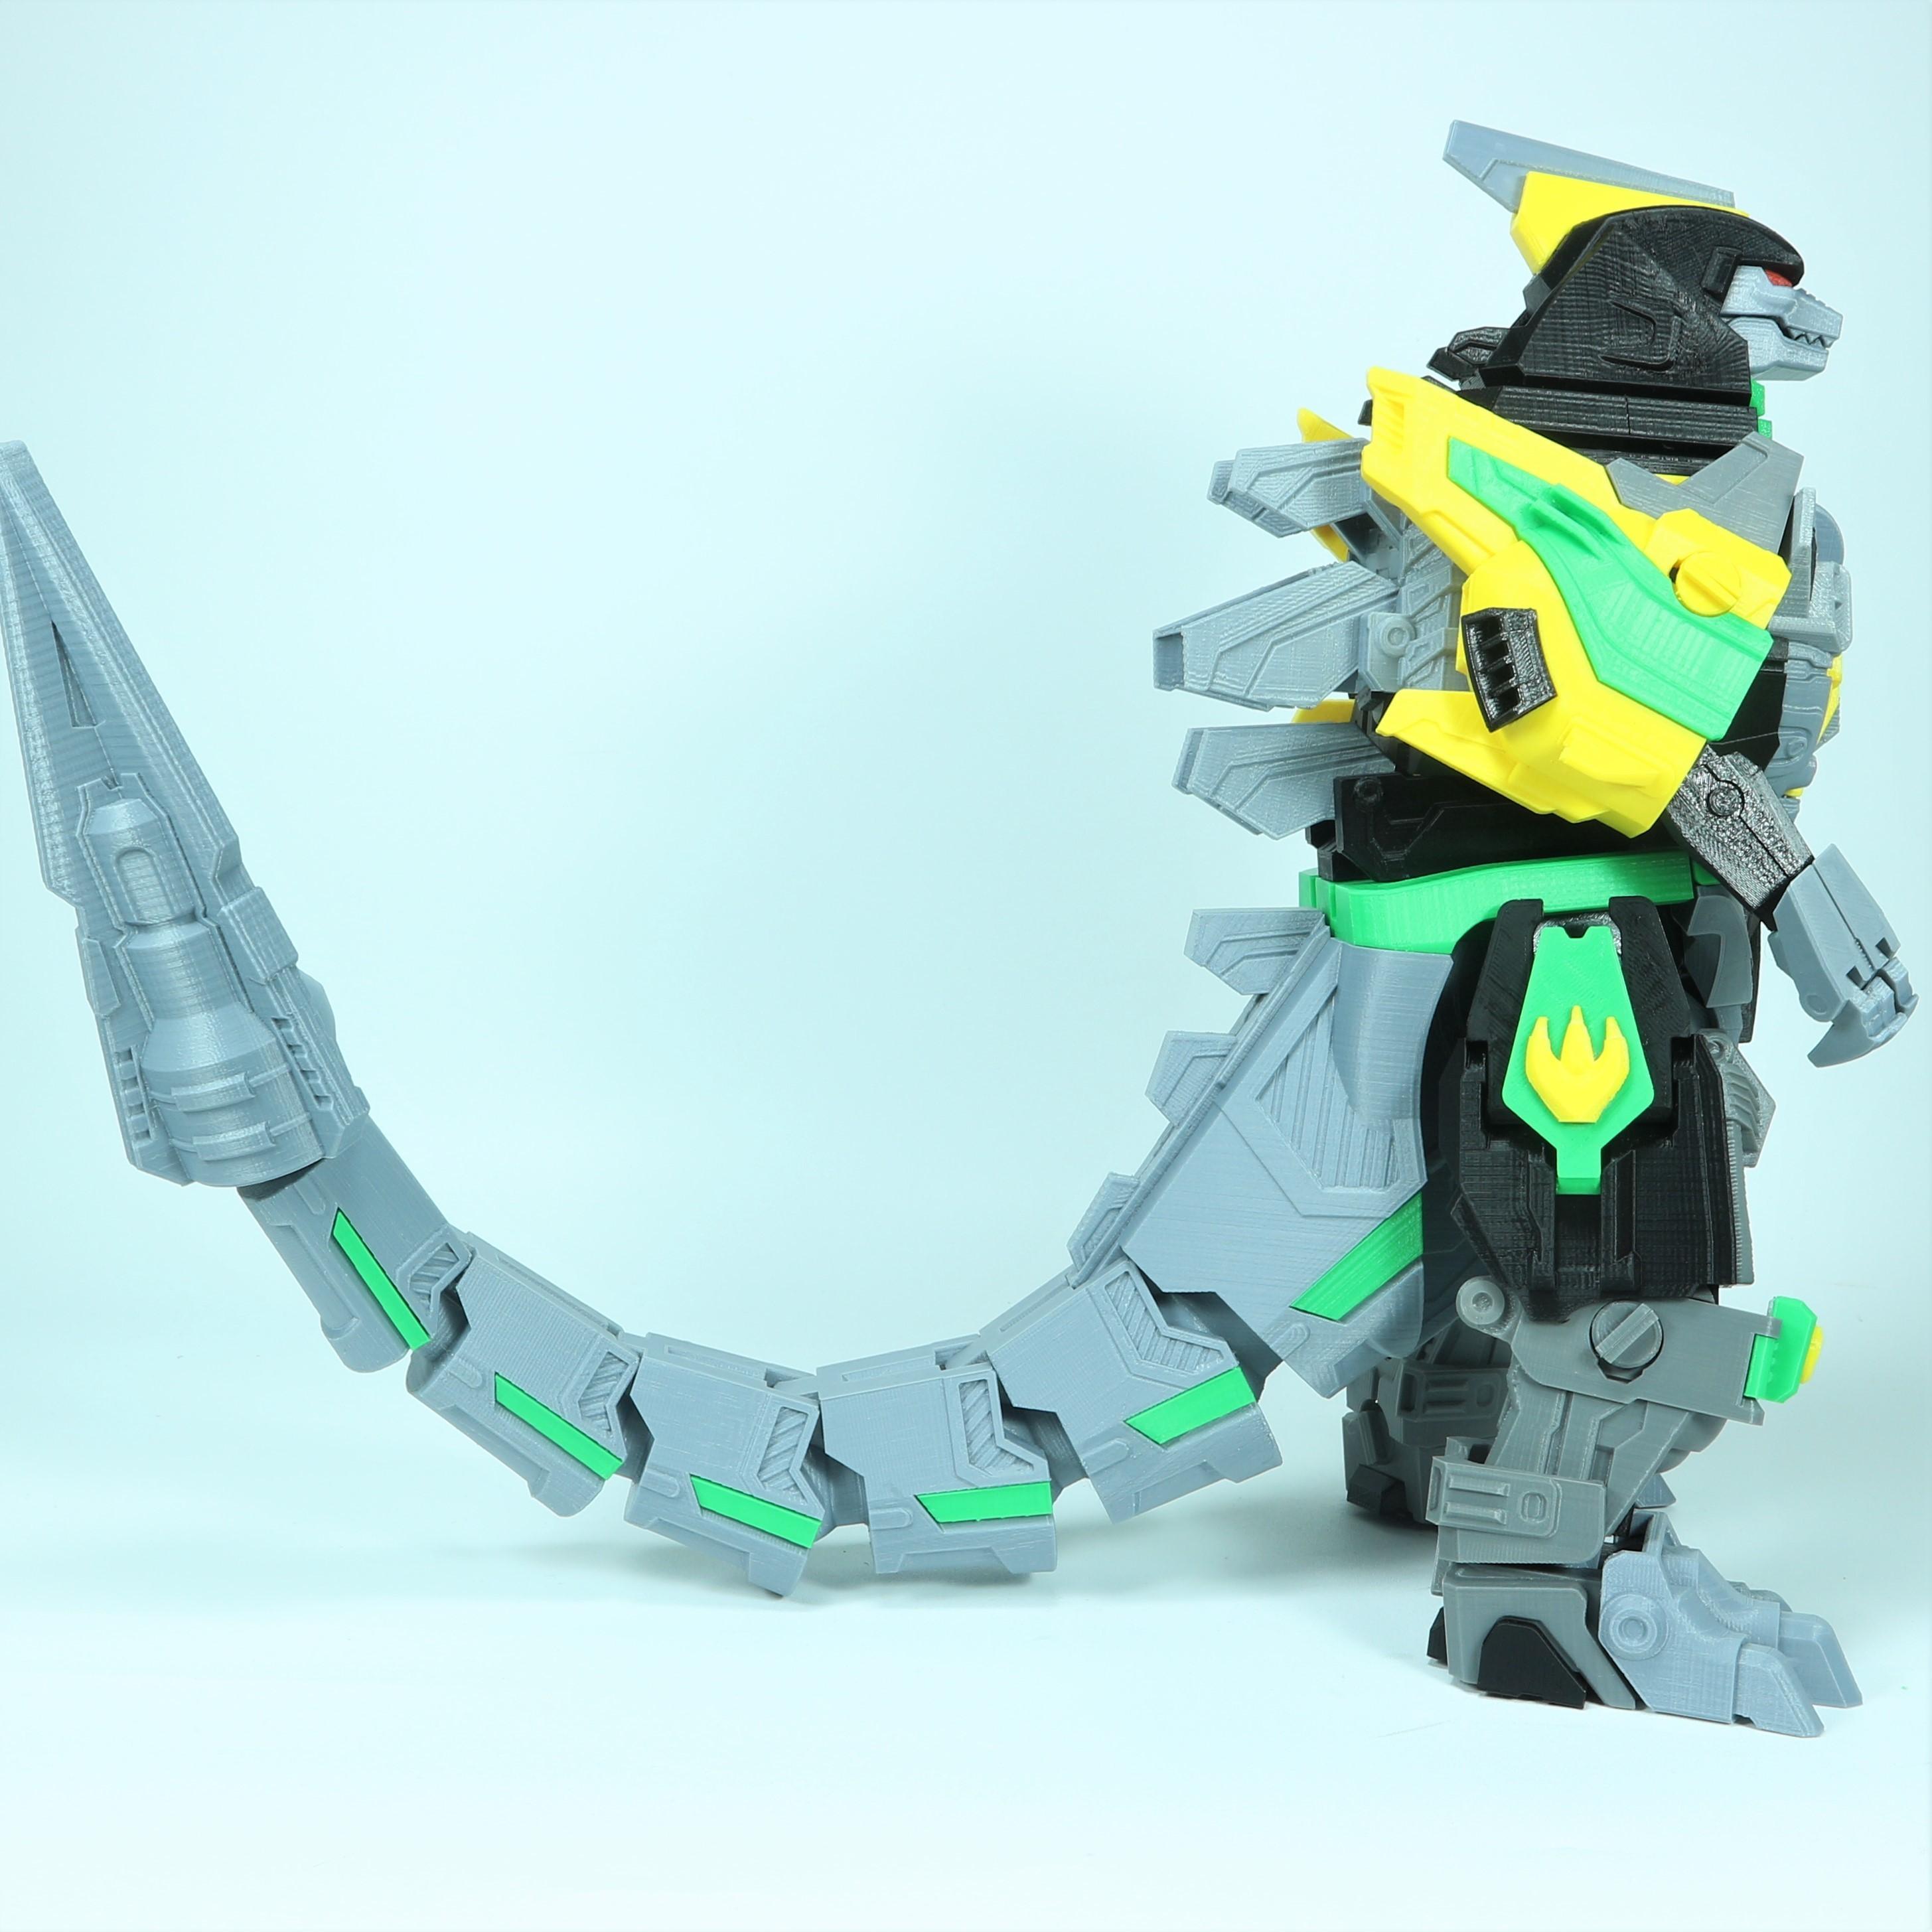 Drag_1X1_4.jpg Download STL file ARTICULATED DRAGONLORD (not Dragonzord) - NO SUPPORT • 3D printer model, Toymakr3D